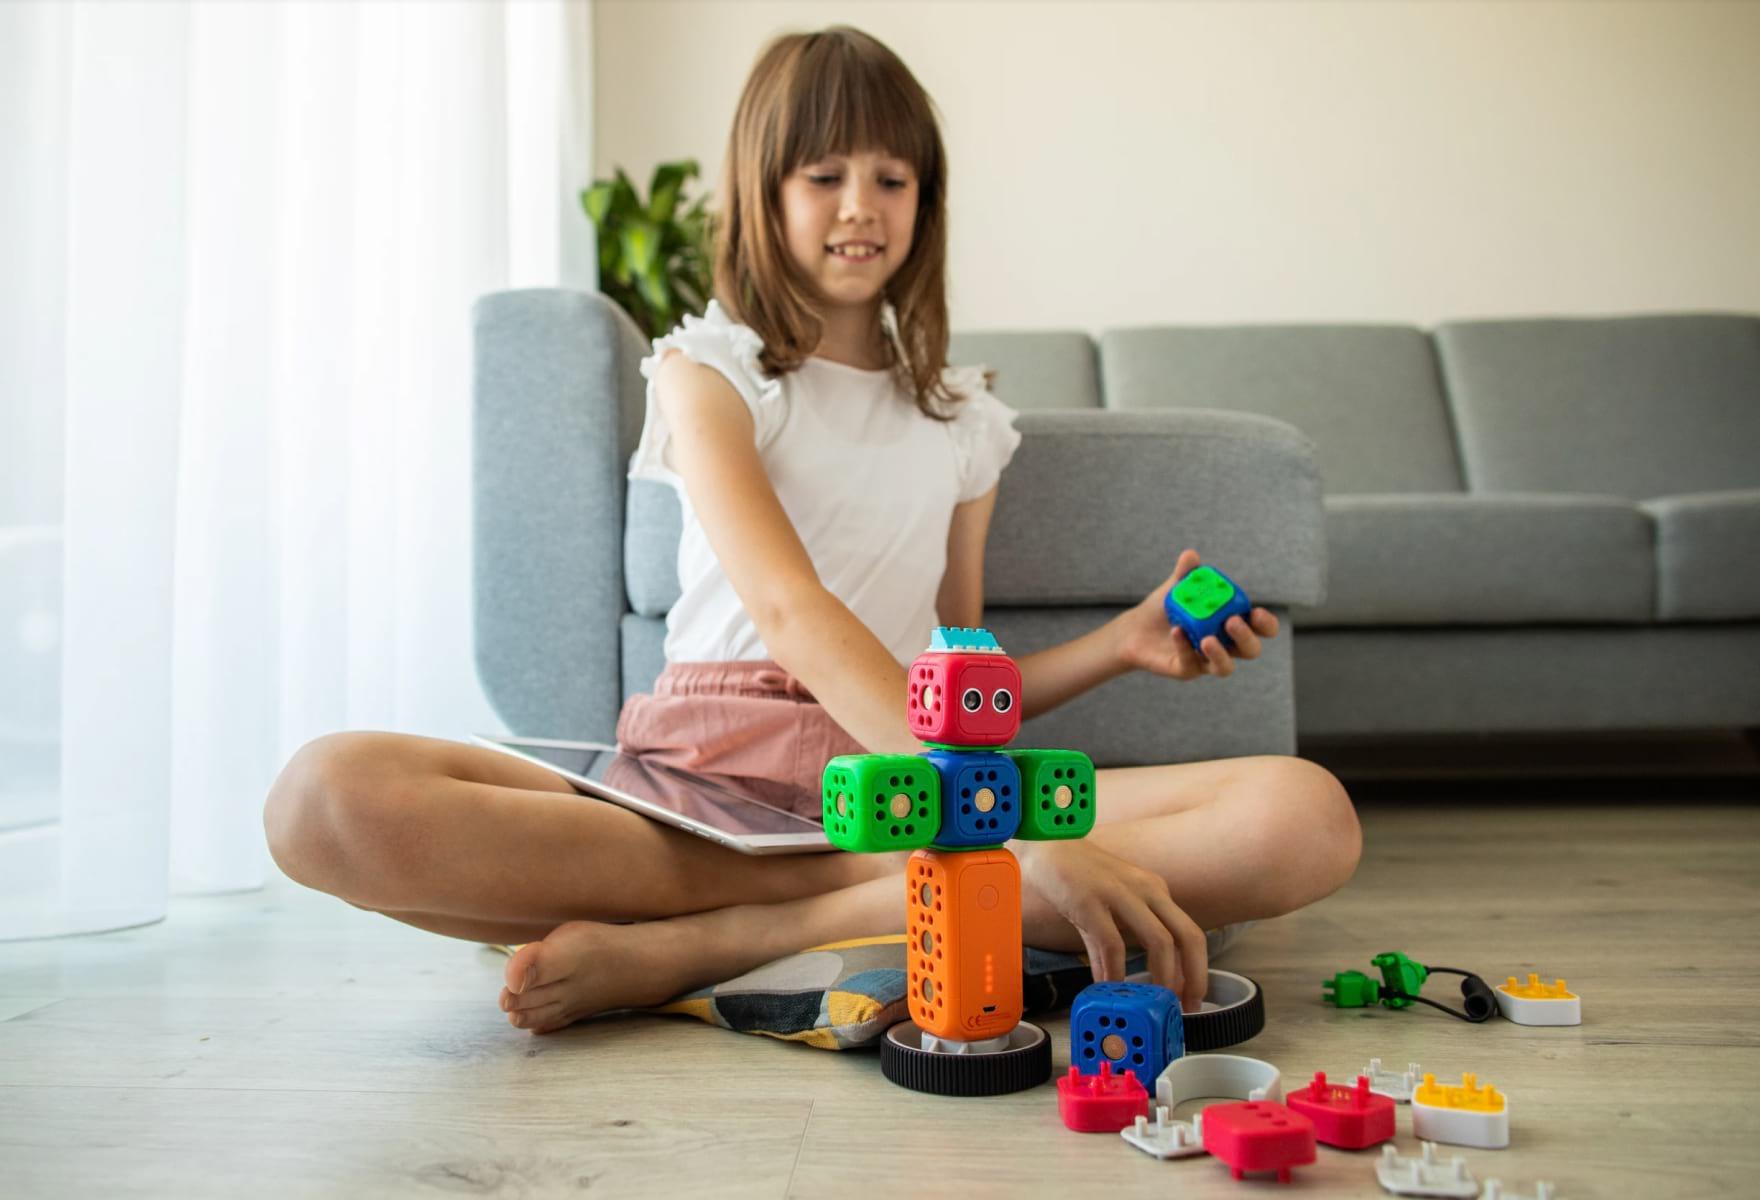 Robo Wunderkind - Robot kits for kids